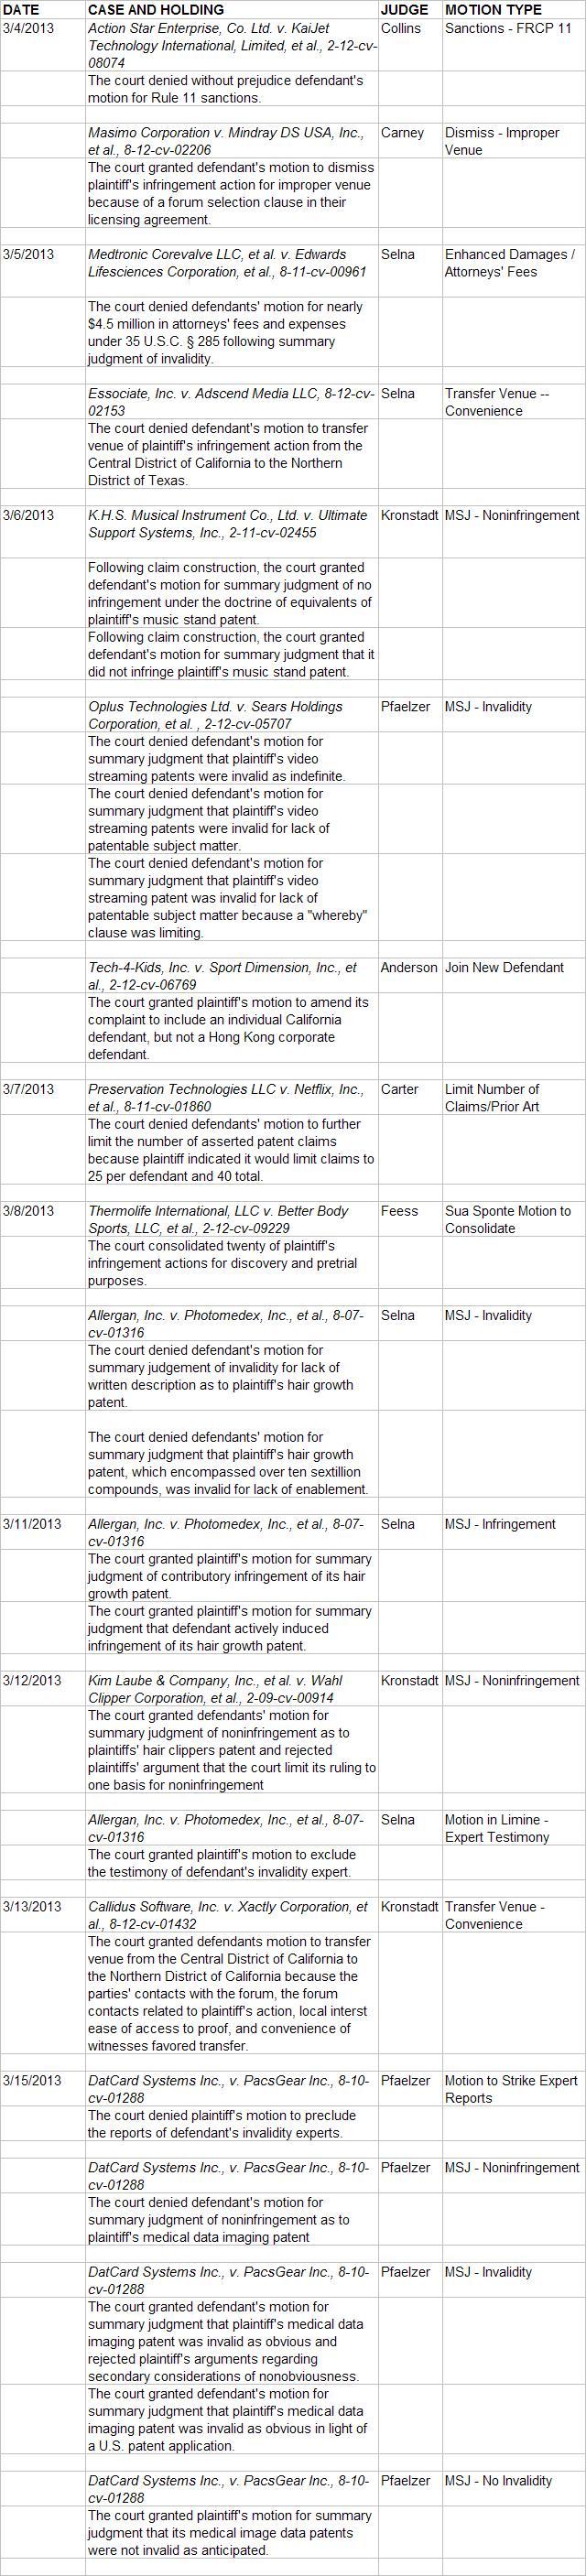 CACD Decisions5.JPG